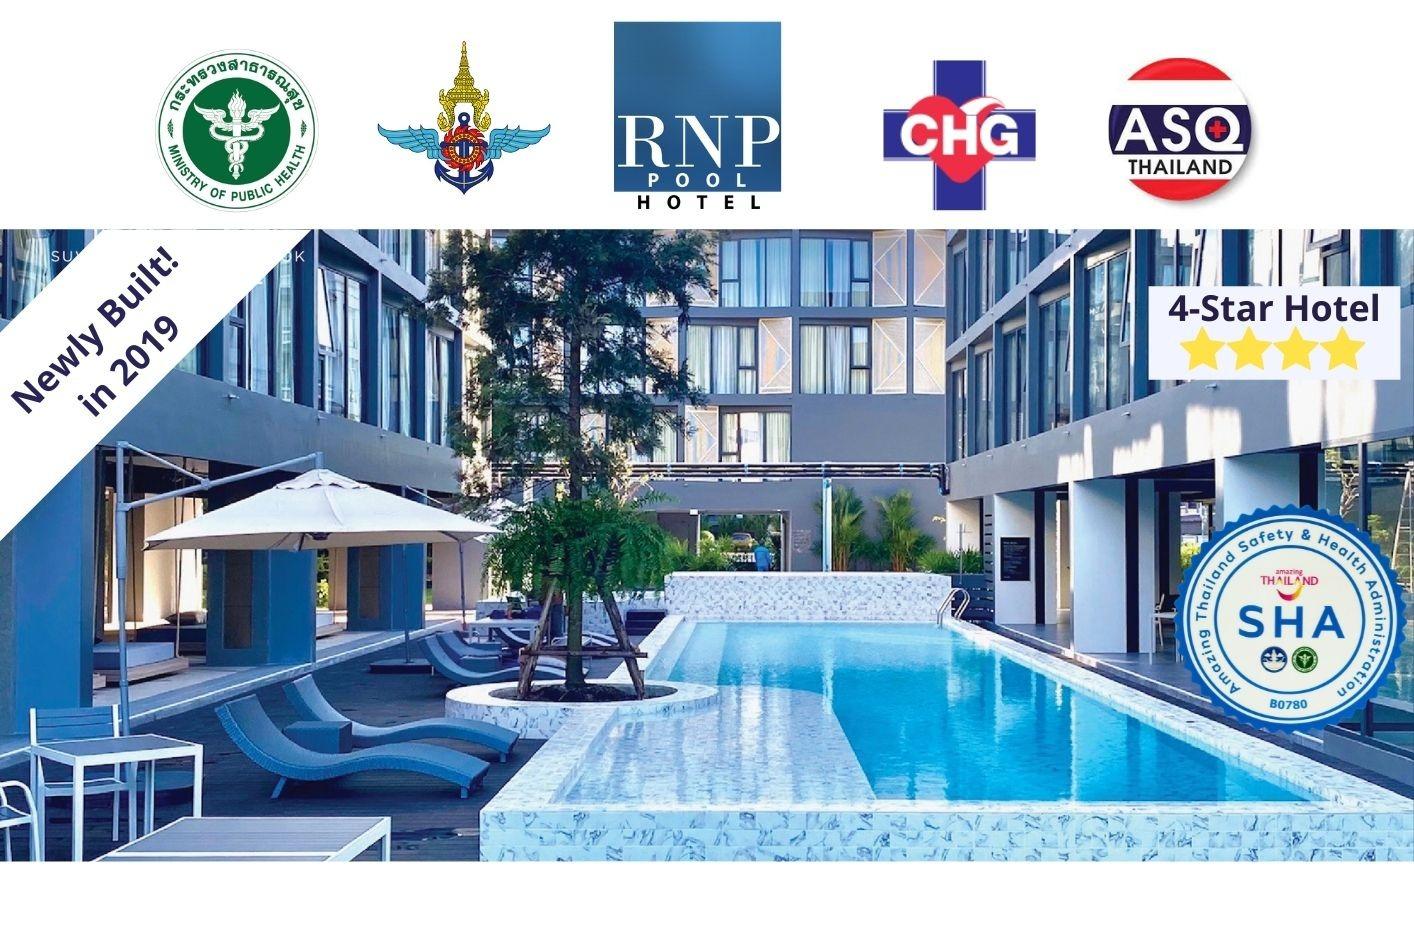 RNP Pool Hotel - Image 0